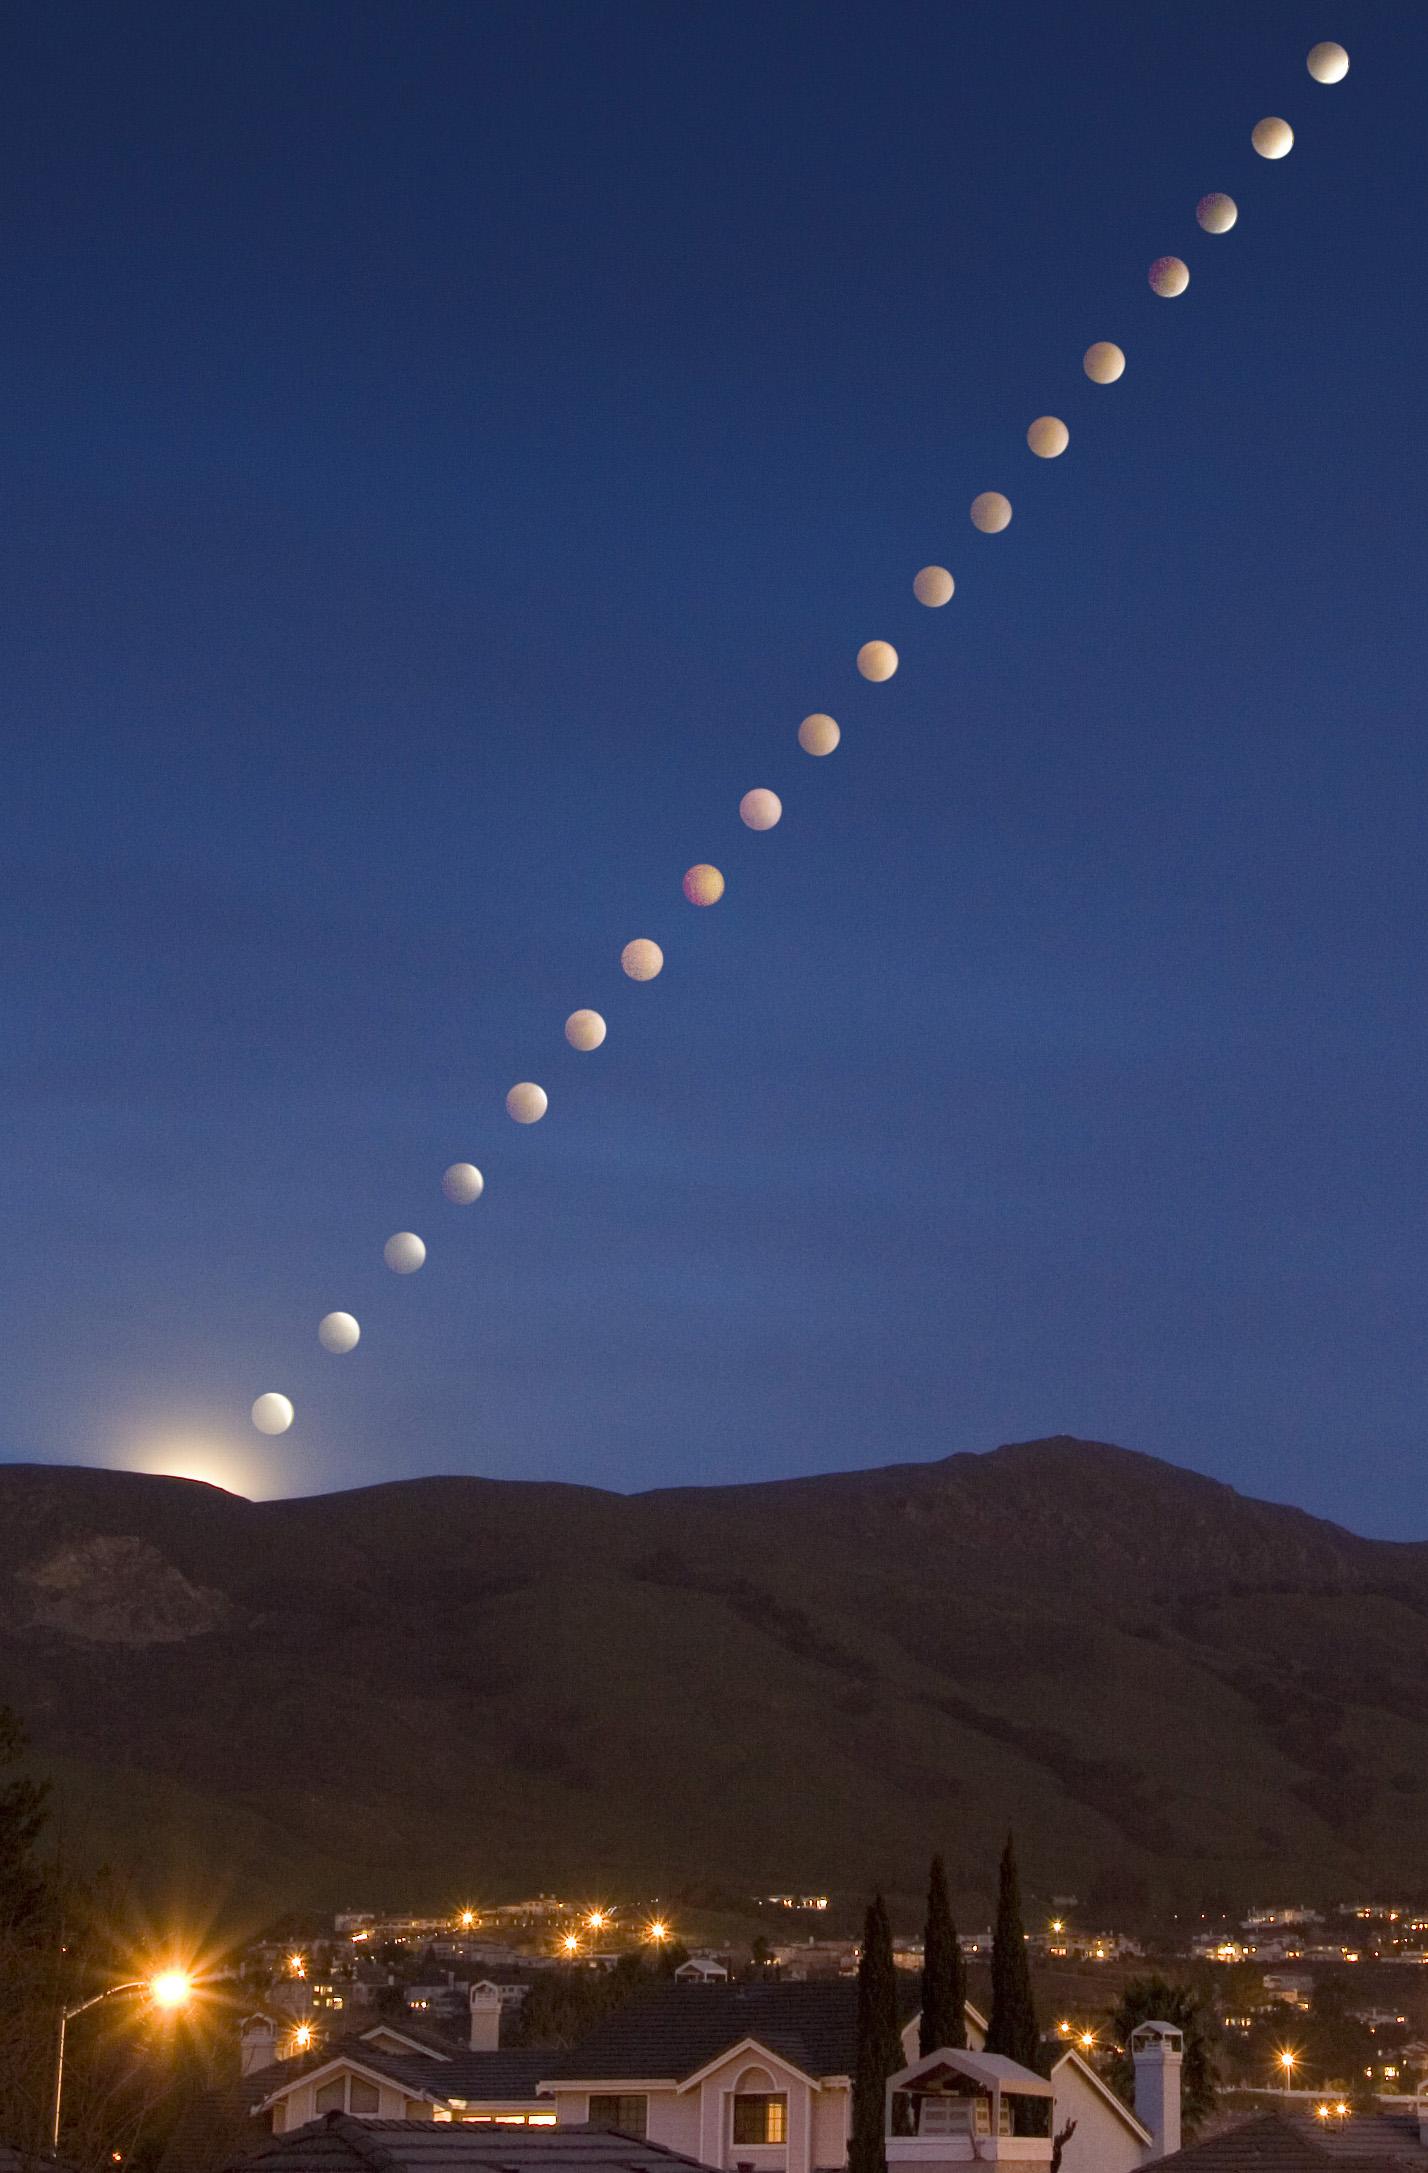 A rare lunar eclipse (shown in time lapse composite) rises over Mission Peak in Feb. 2008